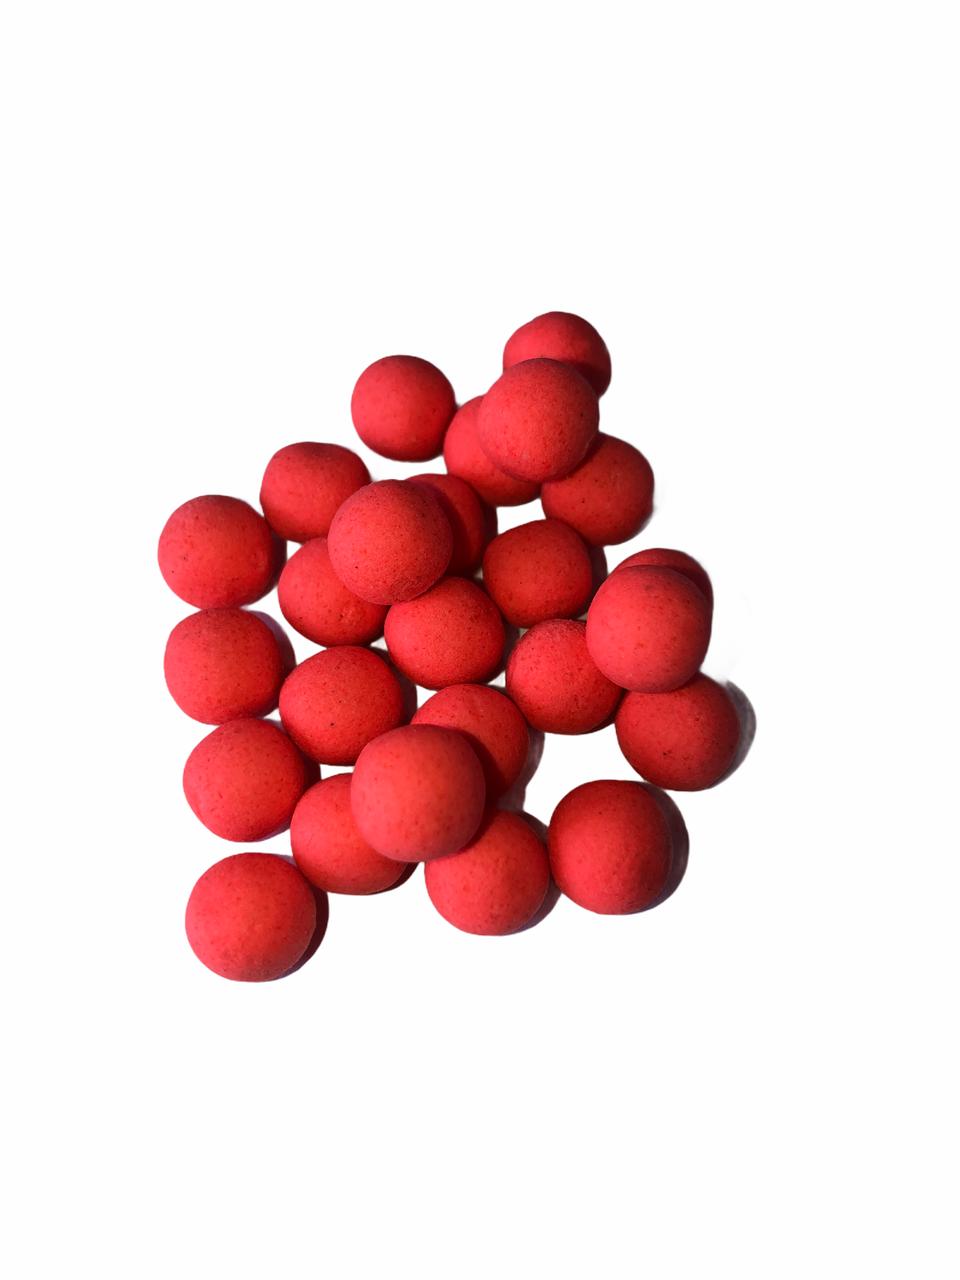 Бойл Профмонтаж Pop-Up d=12мм Клубника 16170